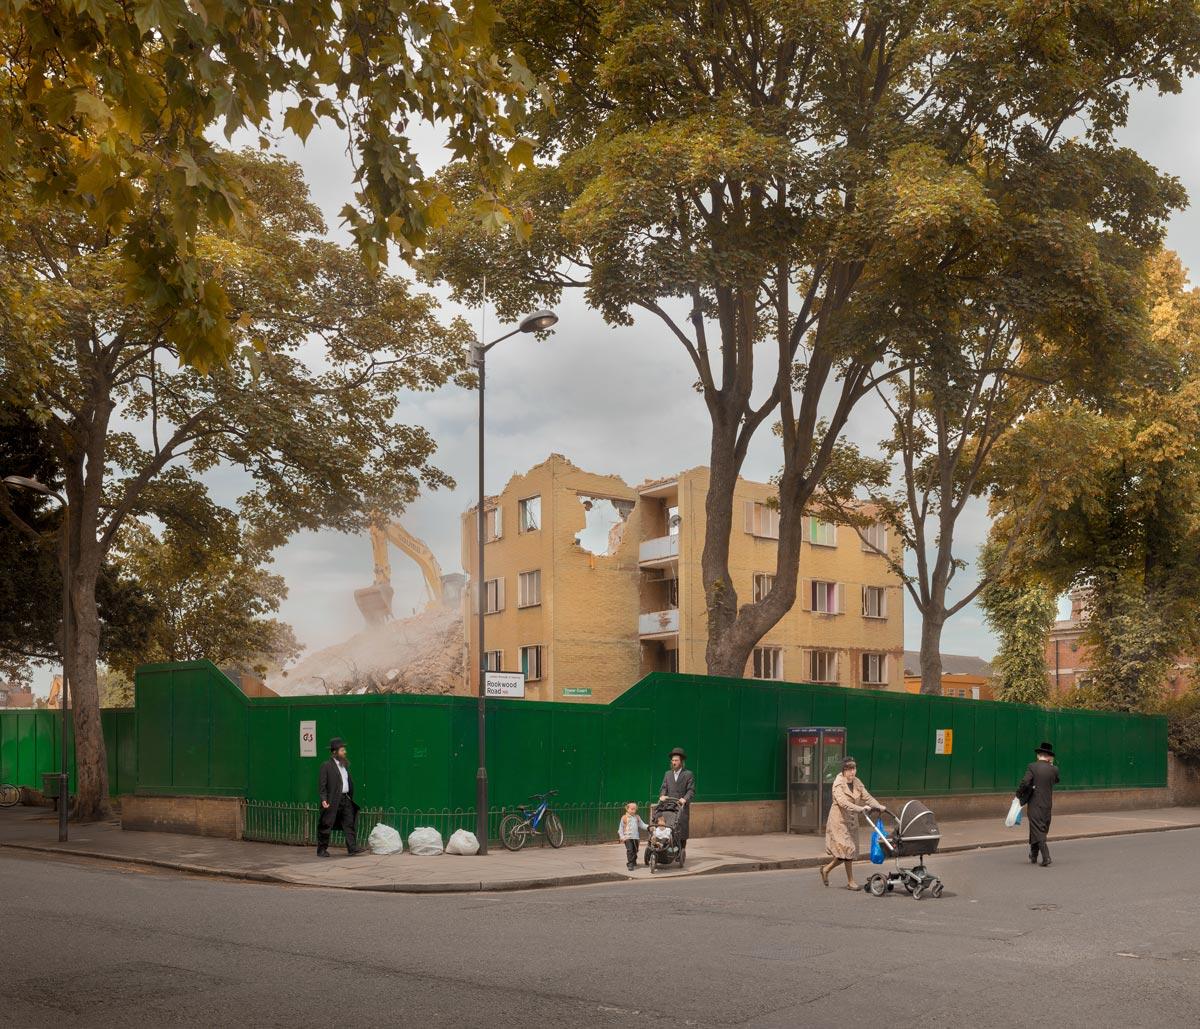 HMP_The-Corners_C.Dorley-Brown_Tower-Court-Demolition-2014_online